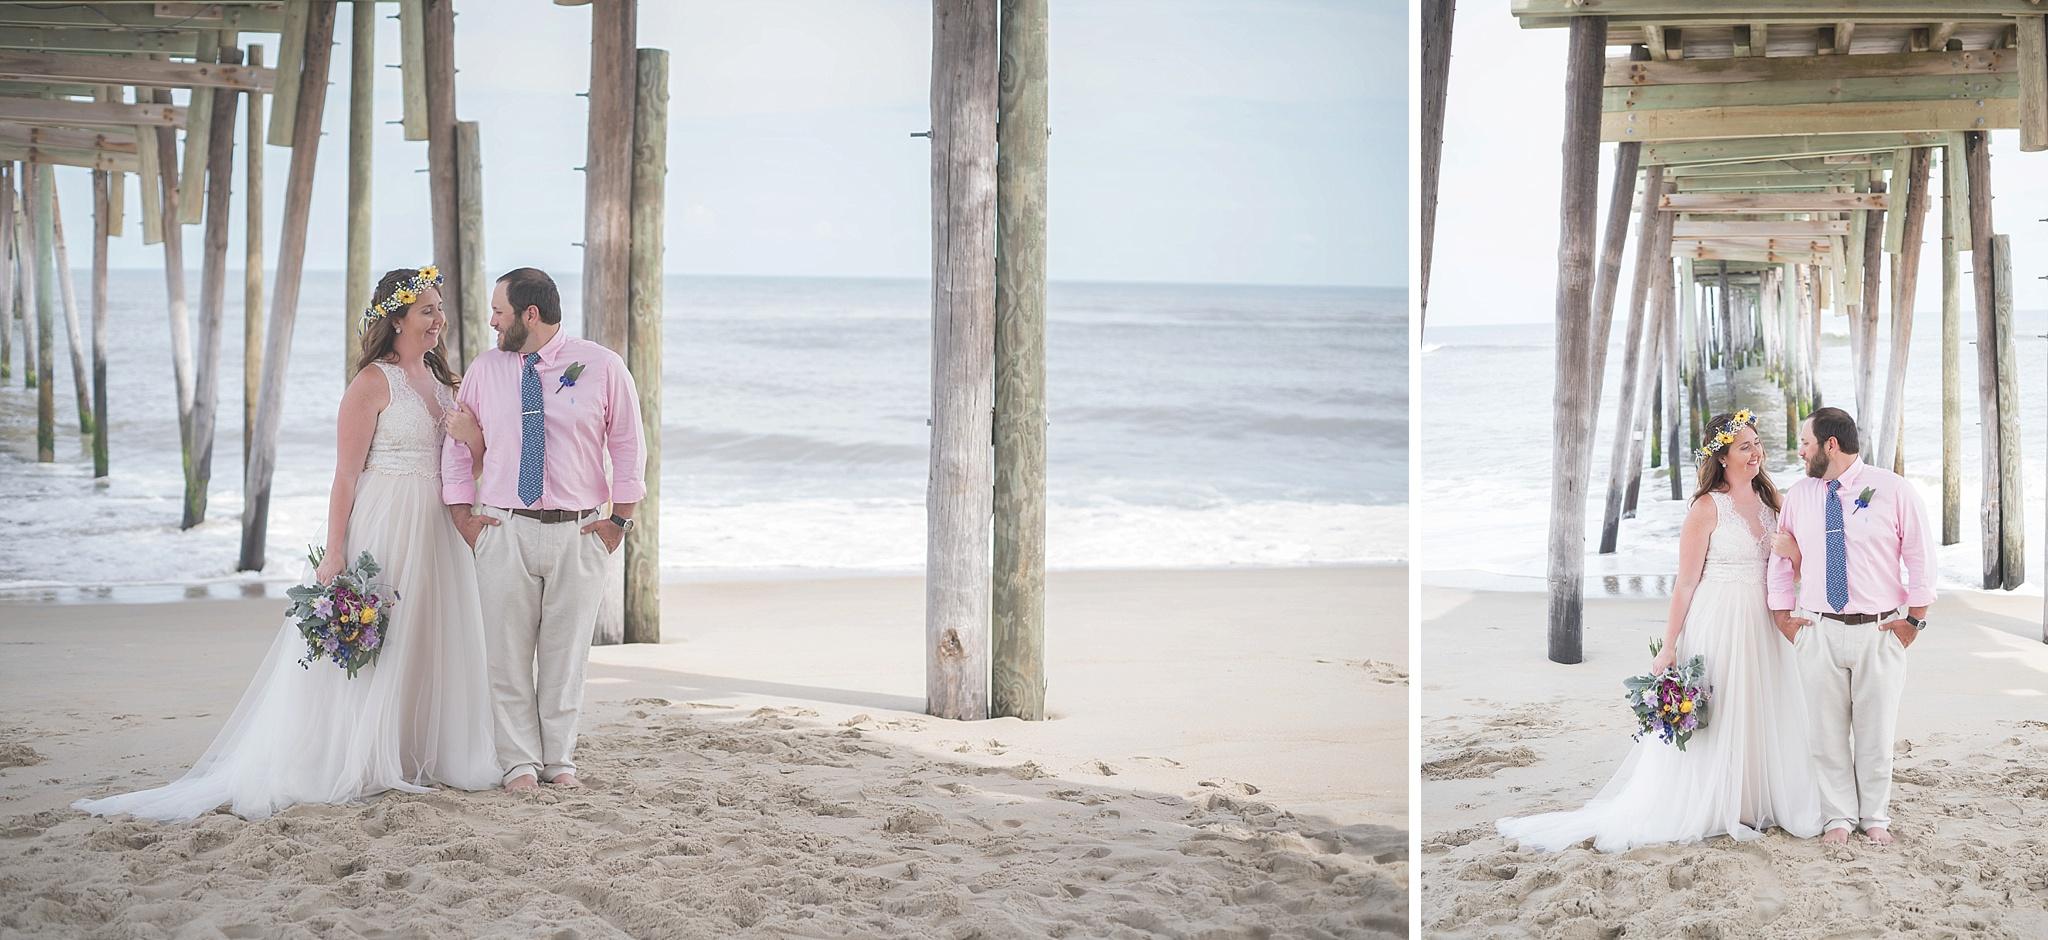 Avon-NC-Wedding-Photographer-213.jpg